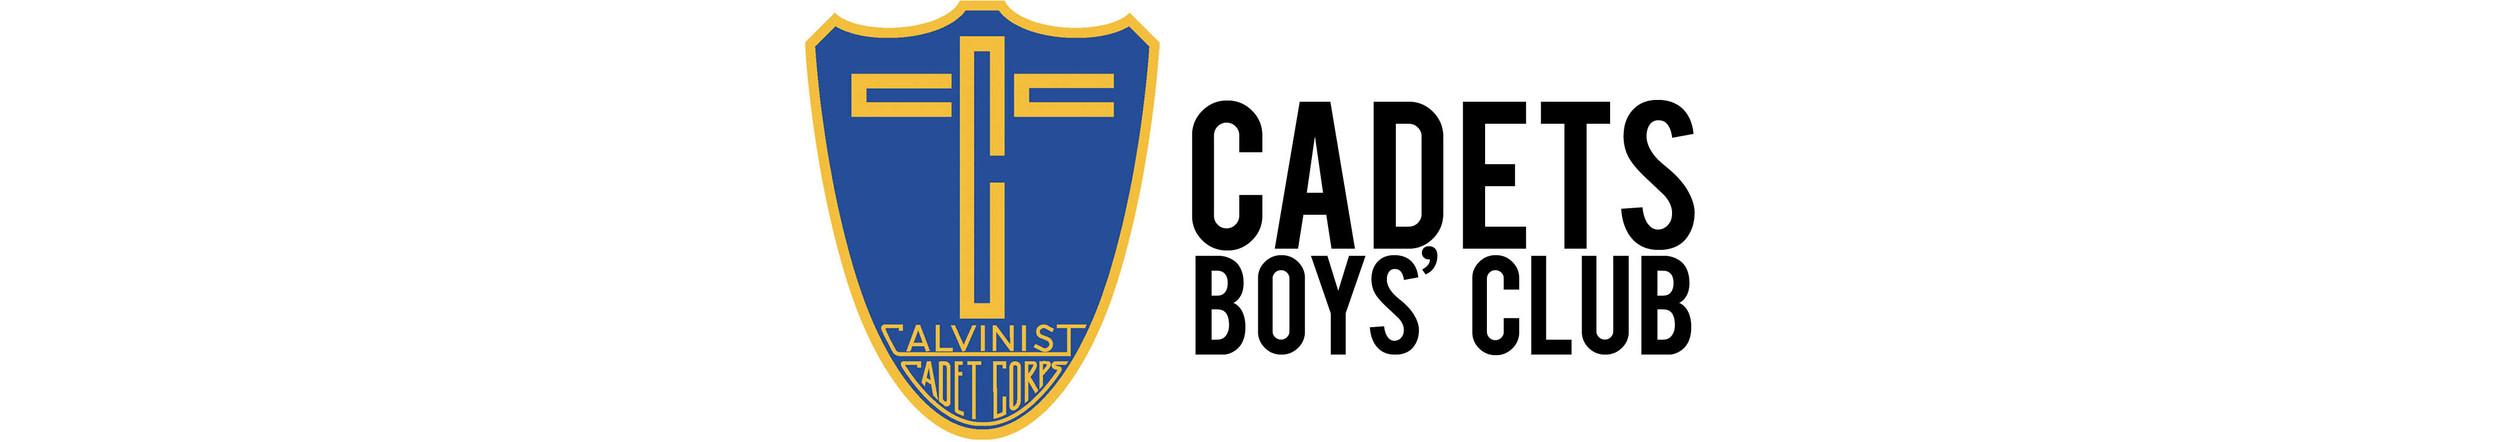 Cadets_banner.jpg